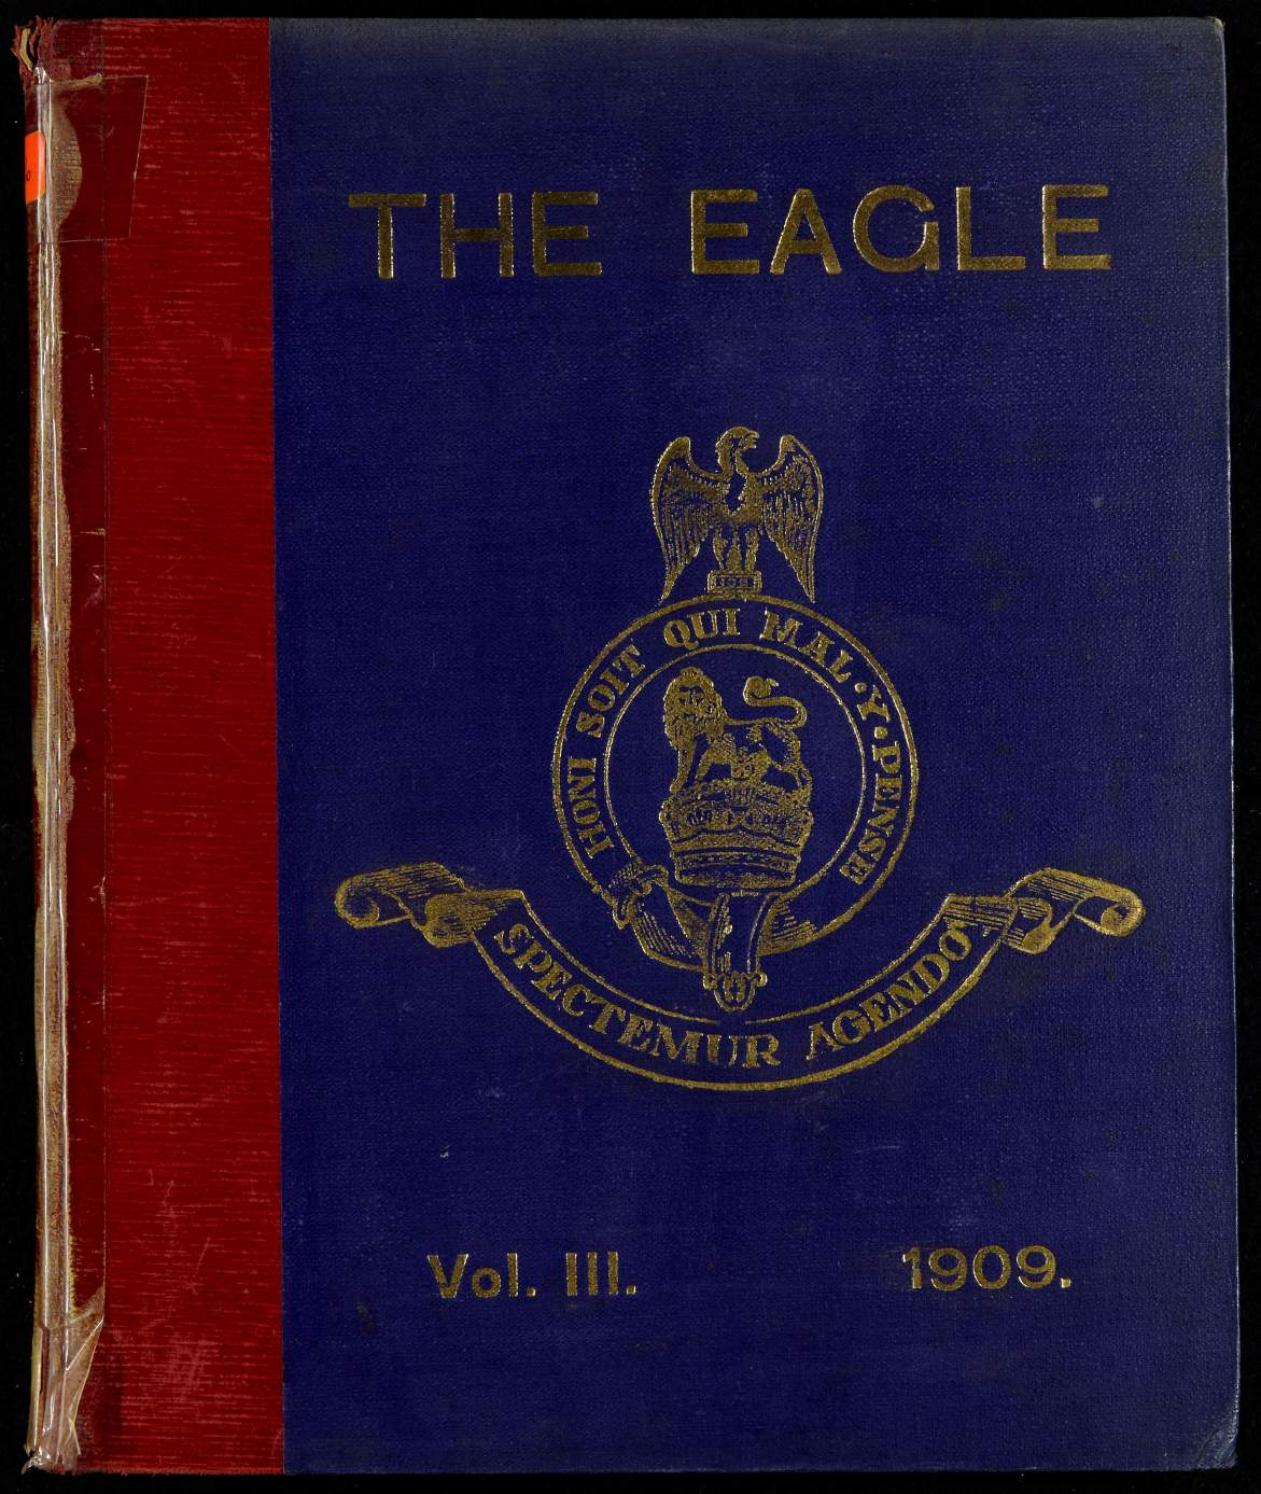 The eagle royal dragoons bound books the eagle 1909